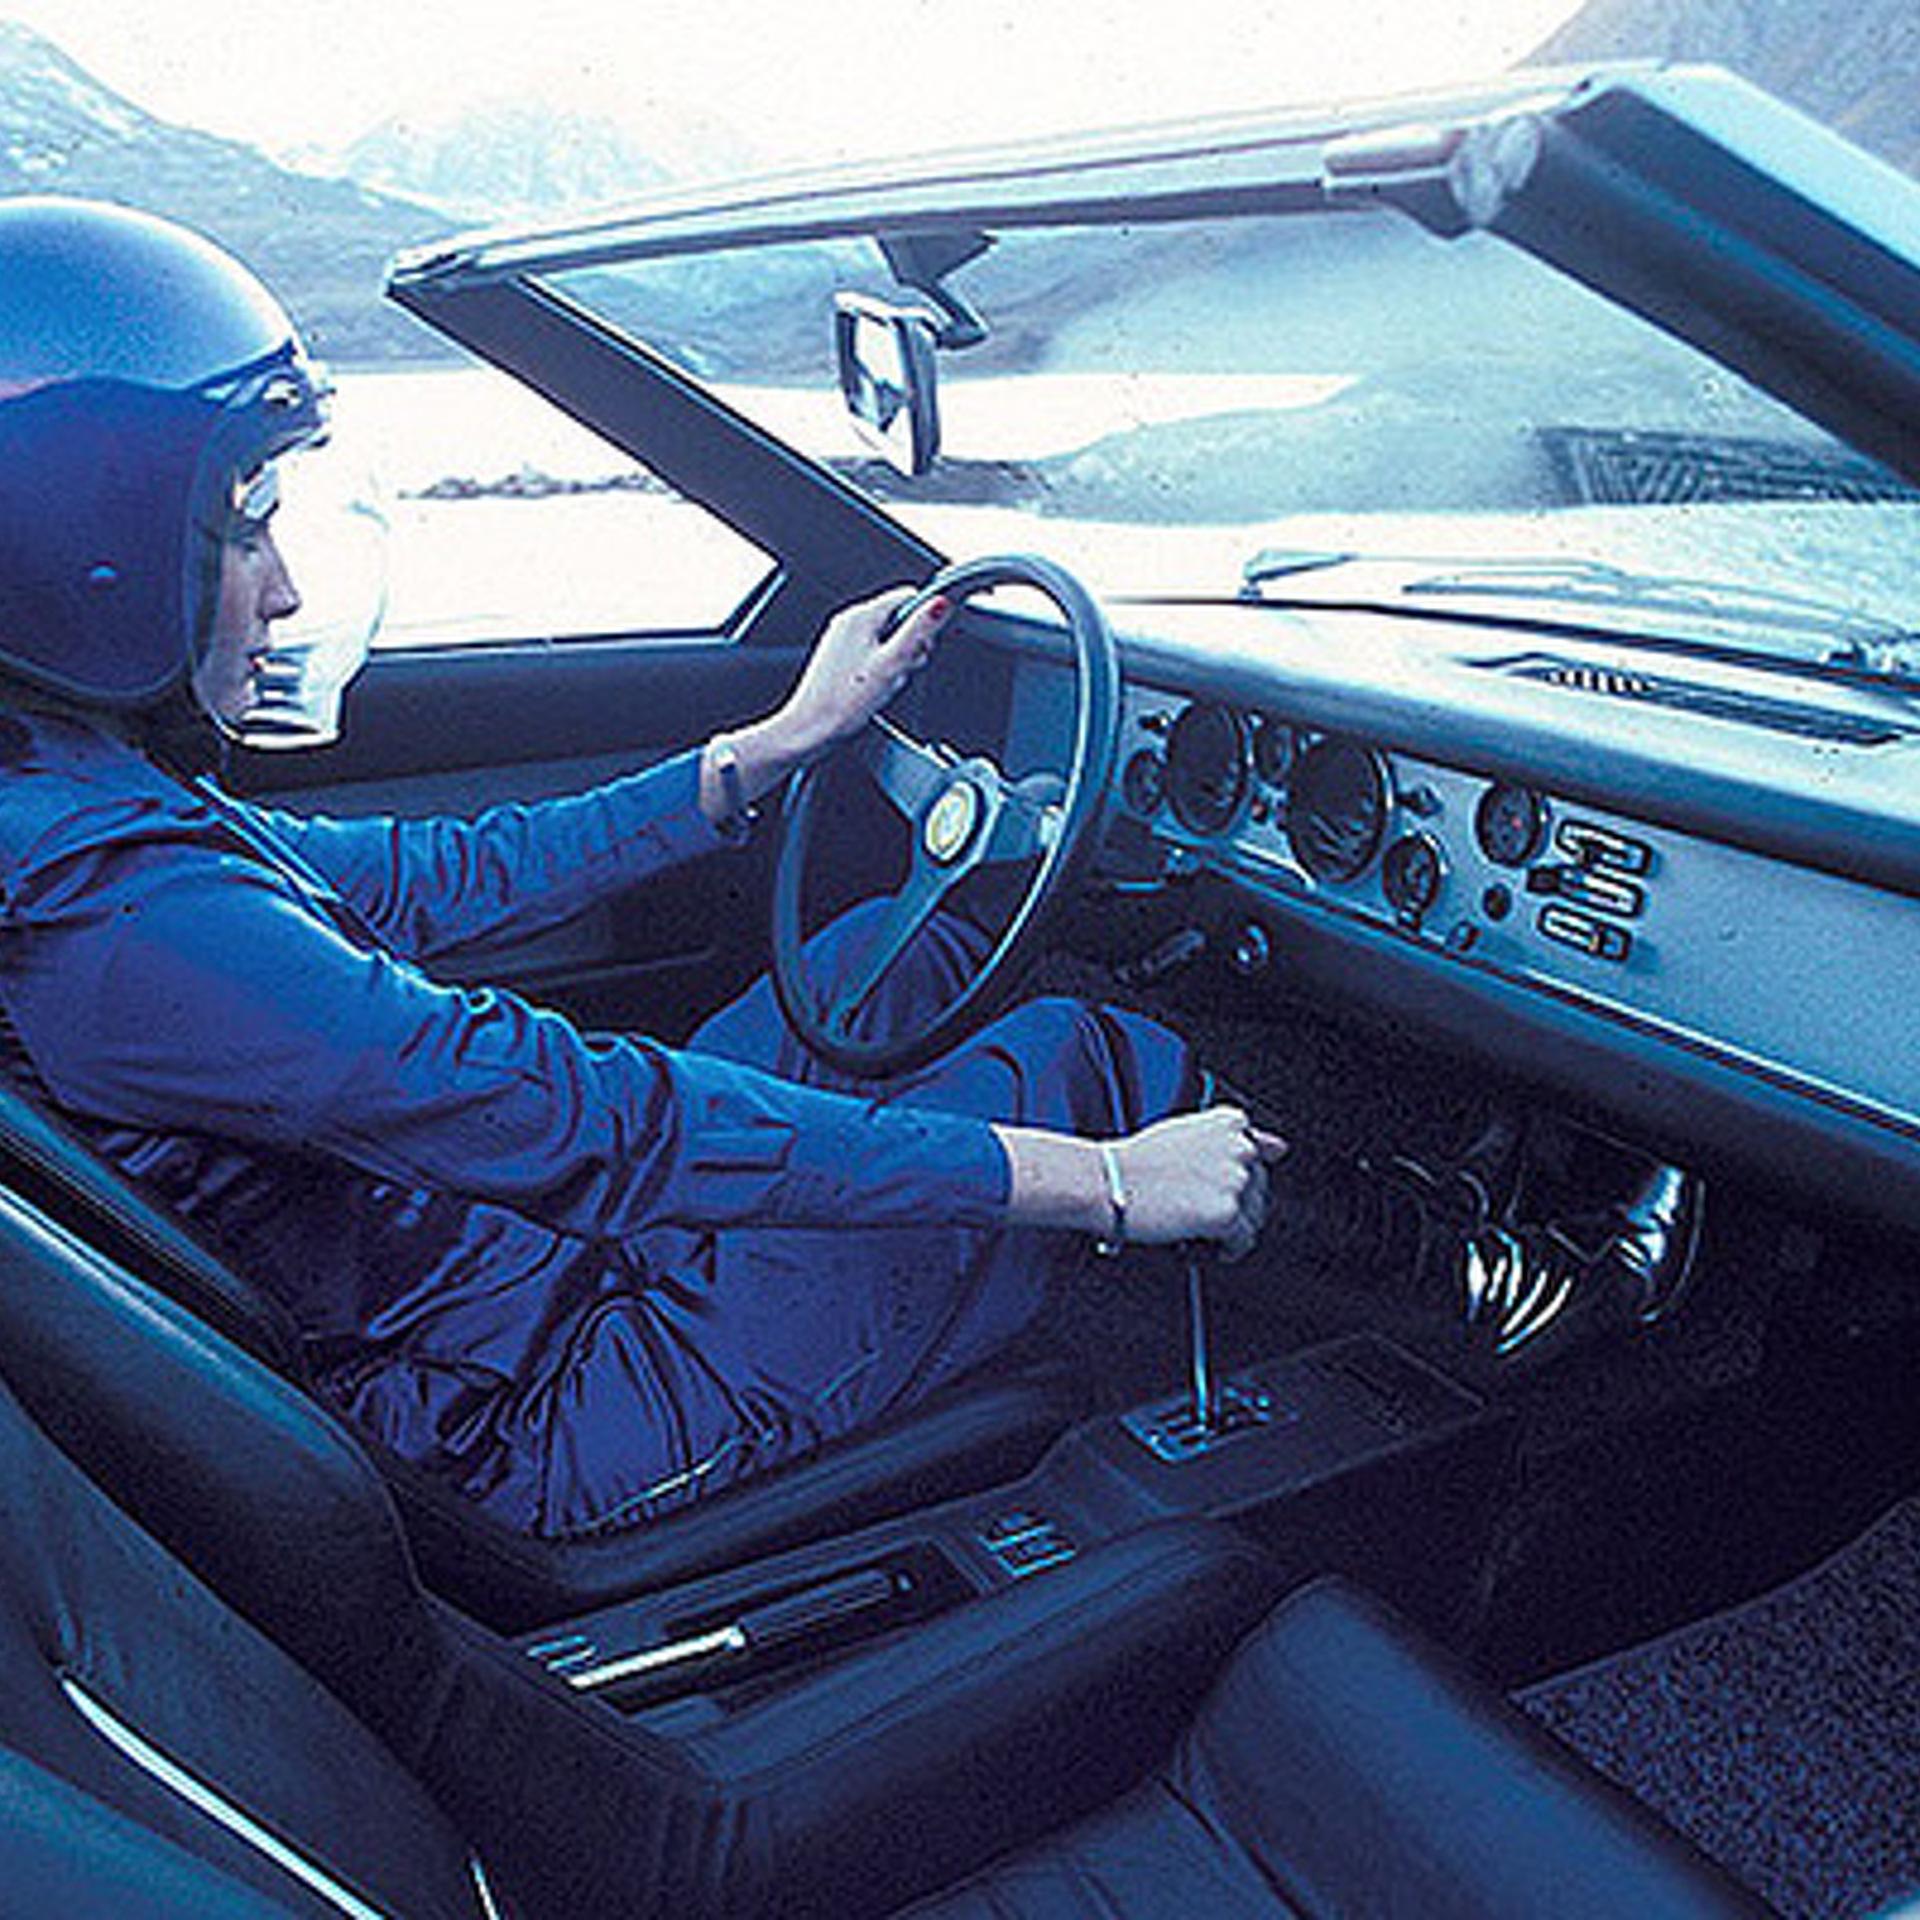 TBT: The 1976 Bertone Rainbow Was a Wild Rebodied Ferrari